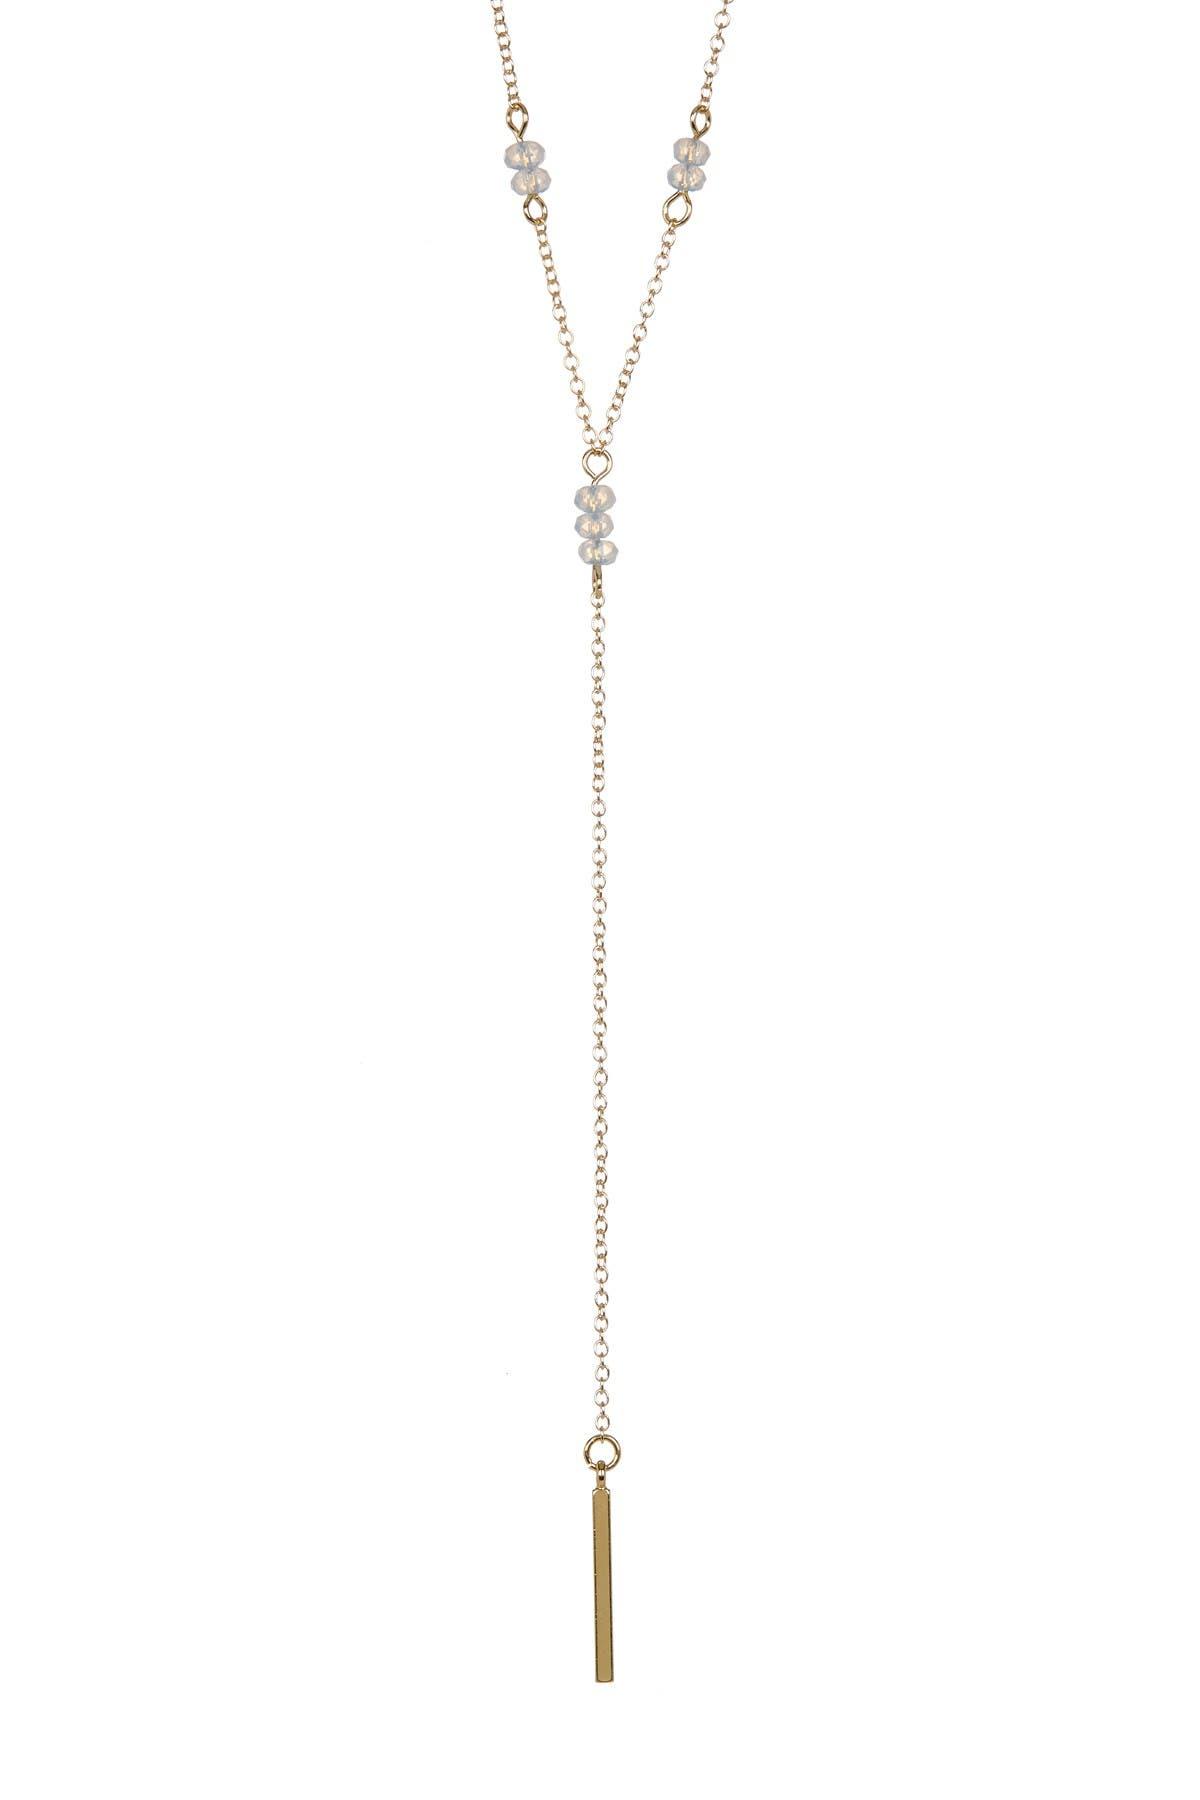 Image of Sterling Forever Moonstone Bar Drop Y Necklace